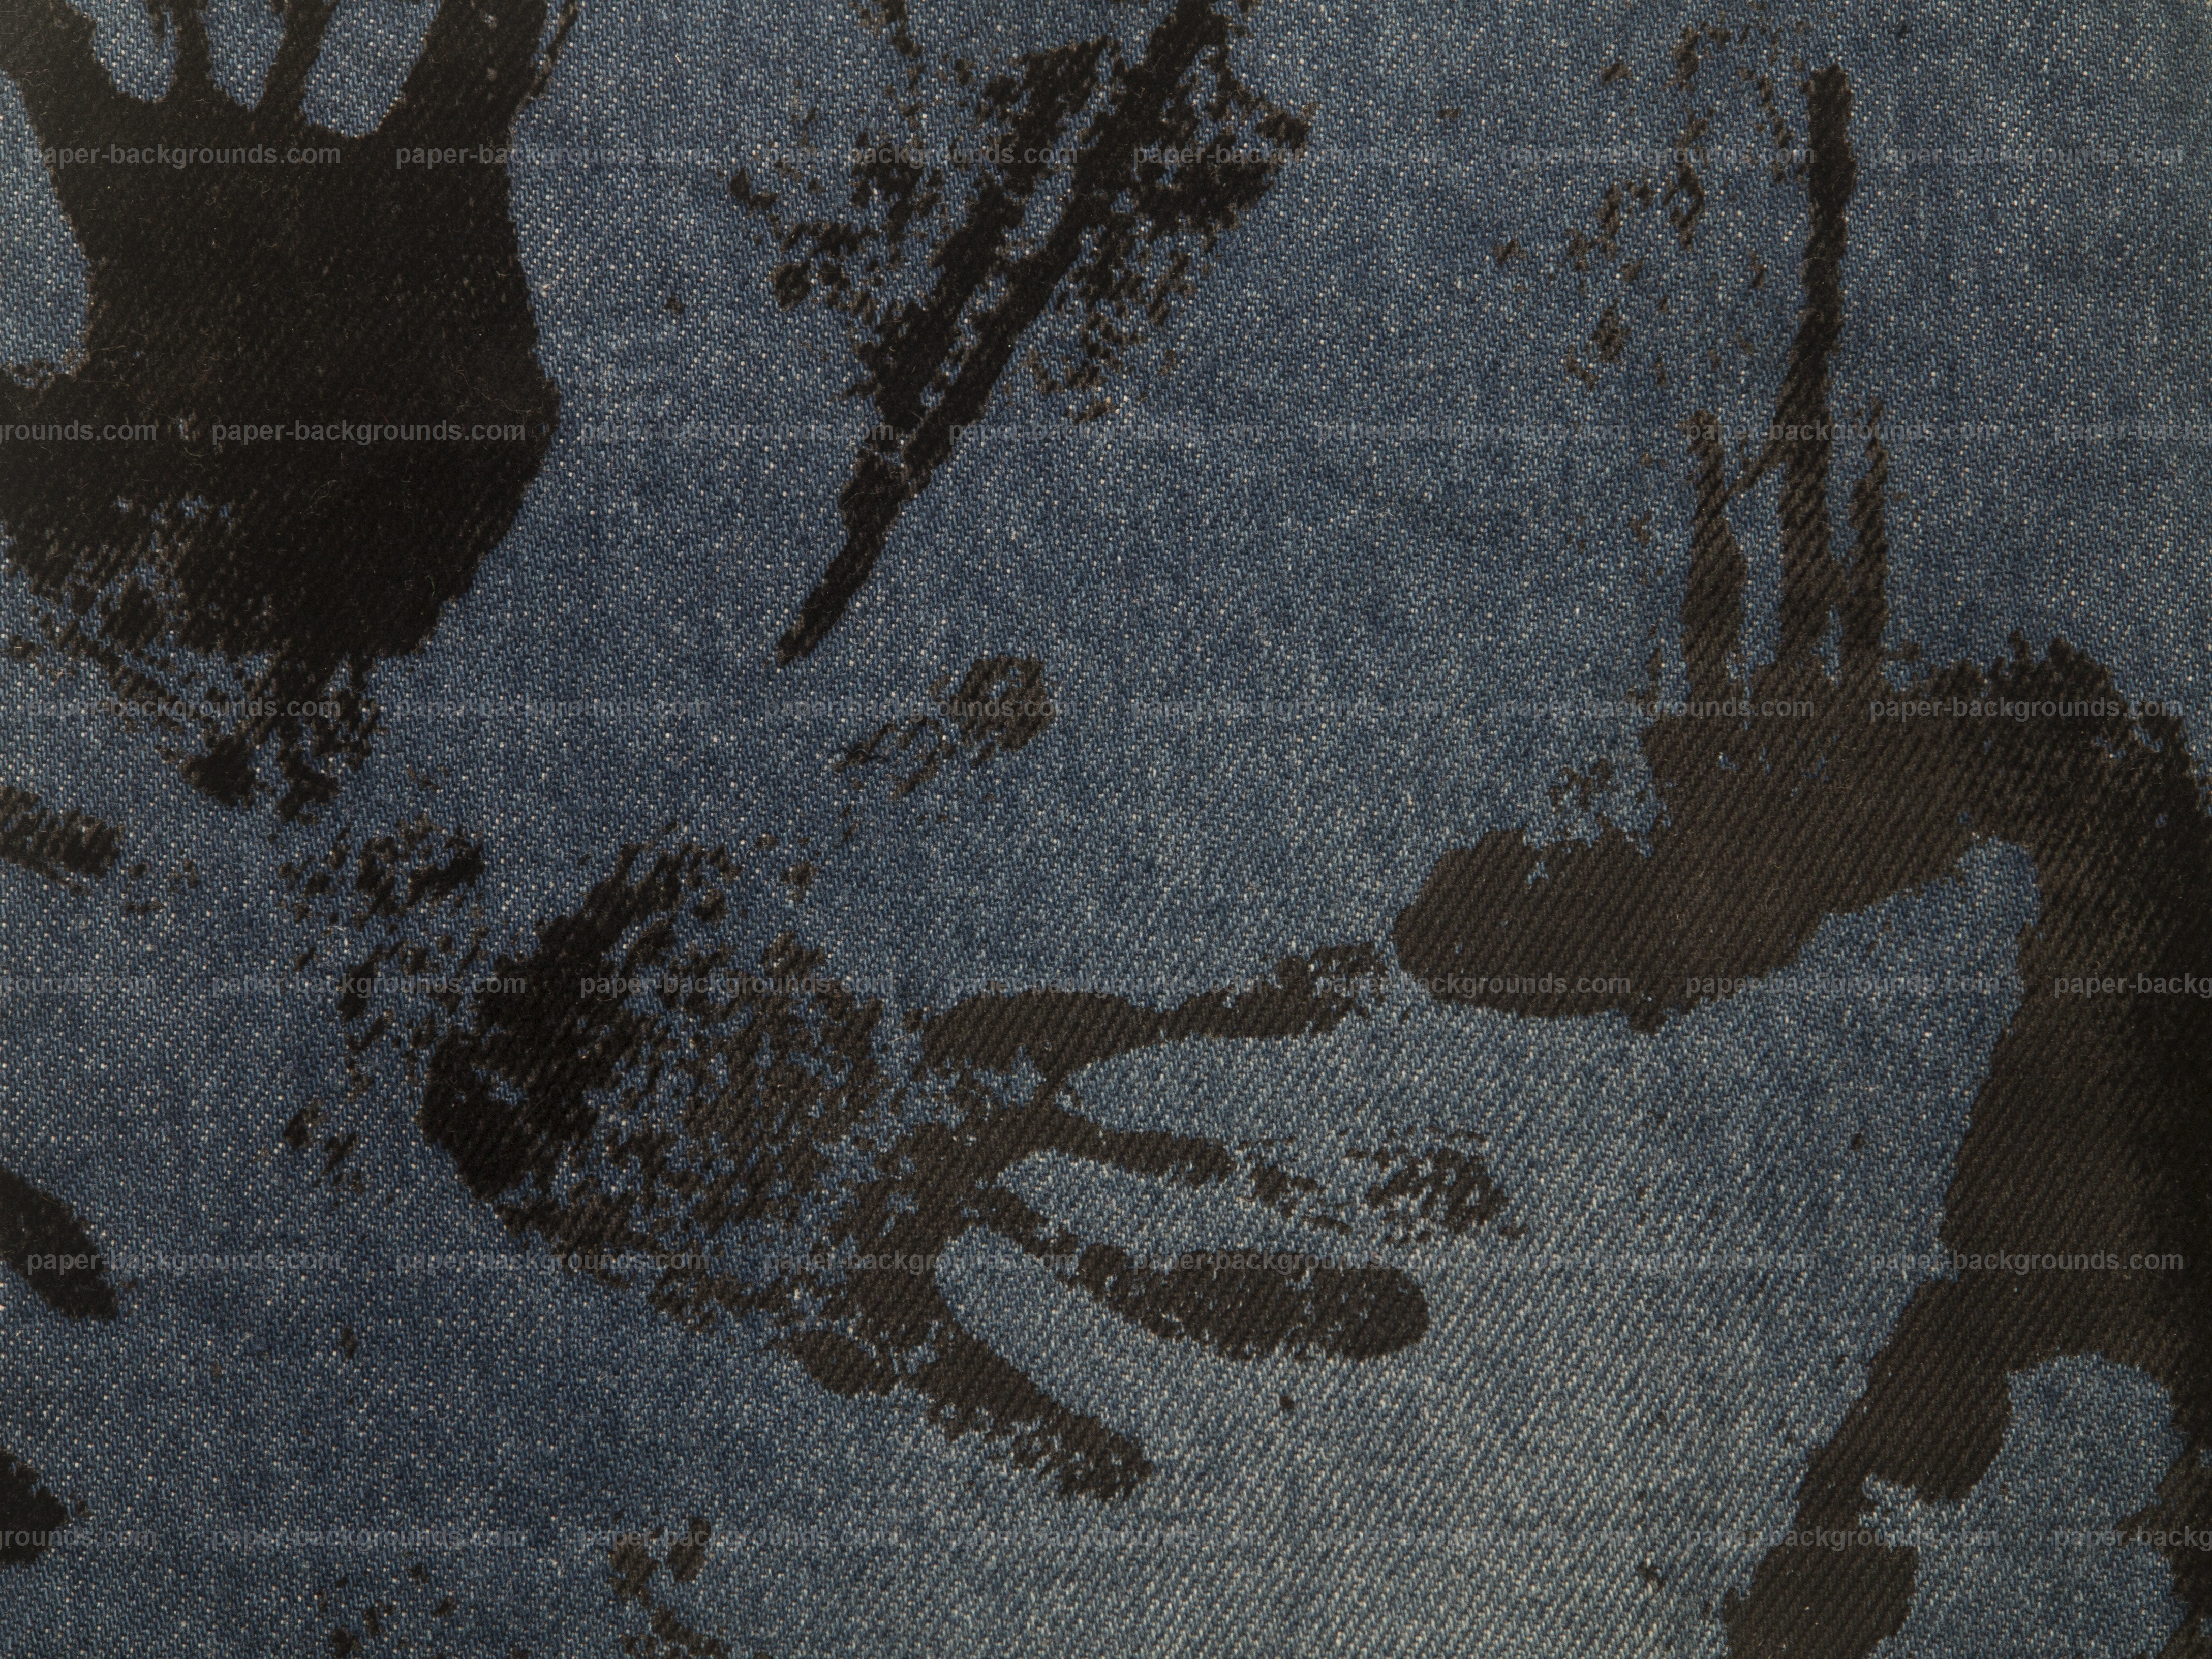 Paper Backgrounds | Blue Jeans Texture With Black Paint Traces